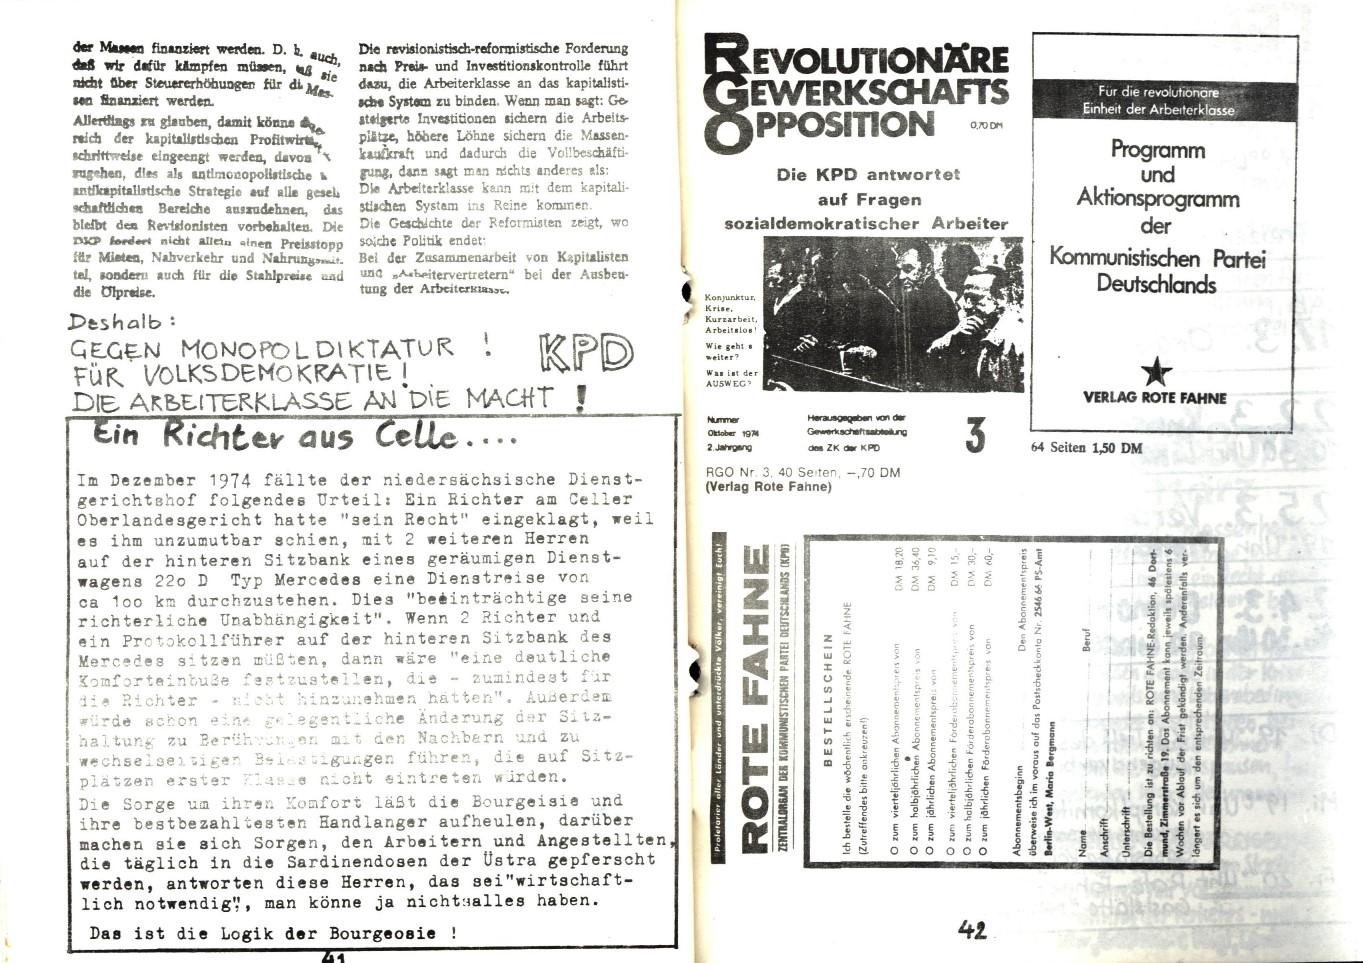 Hannover_AO_1975_Fahrpreisboykott_25